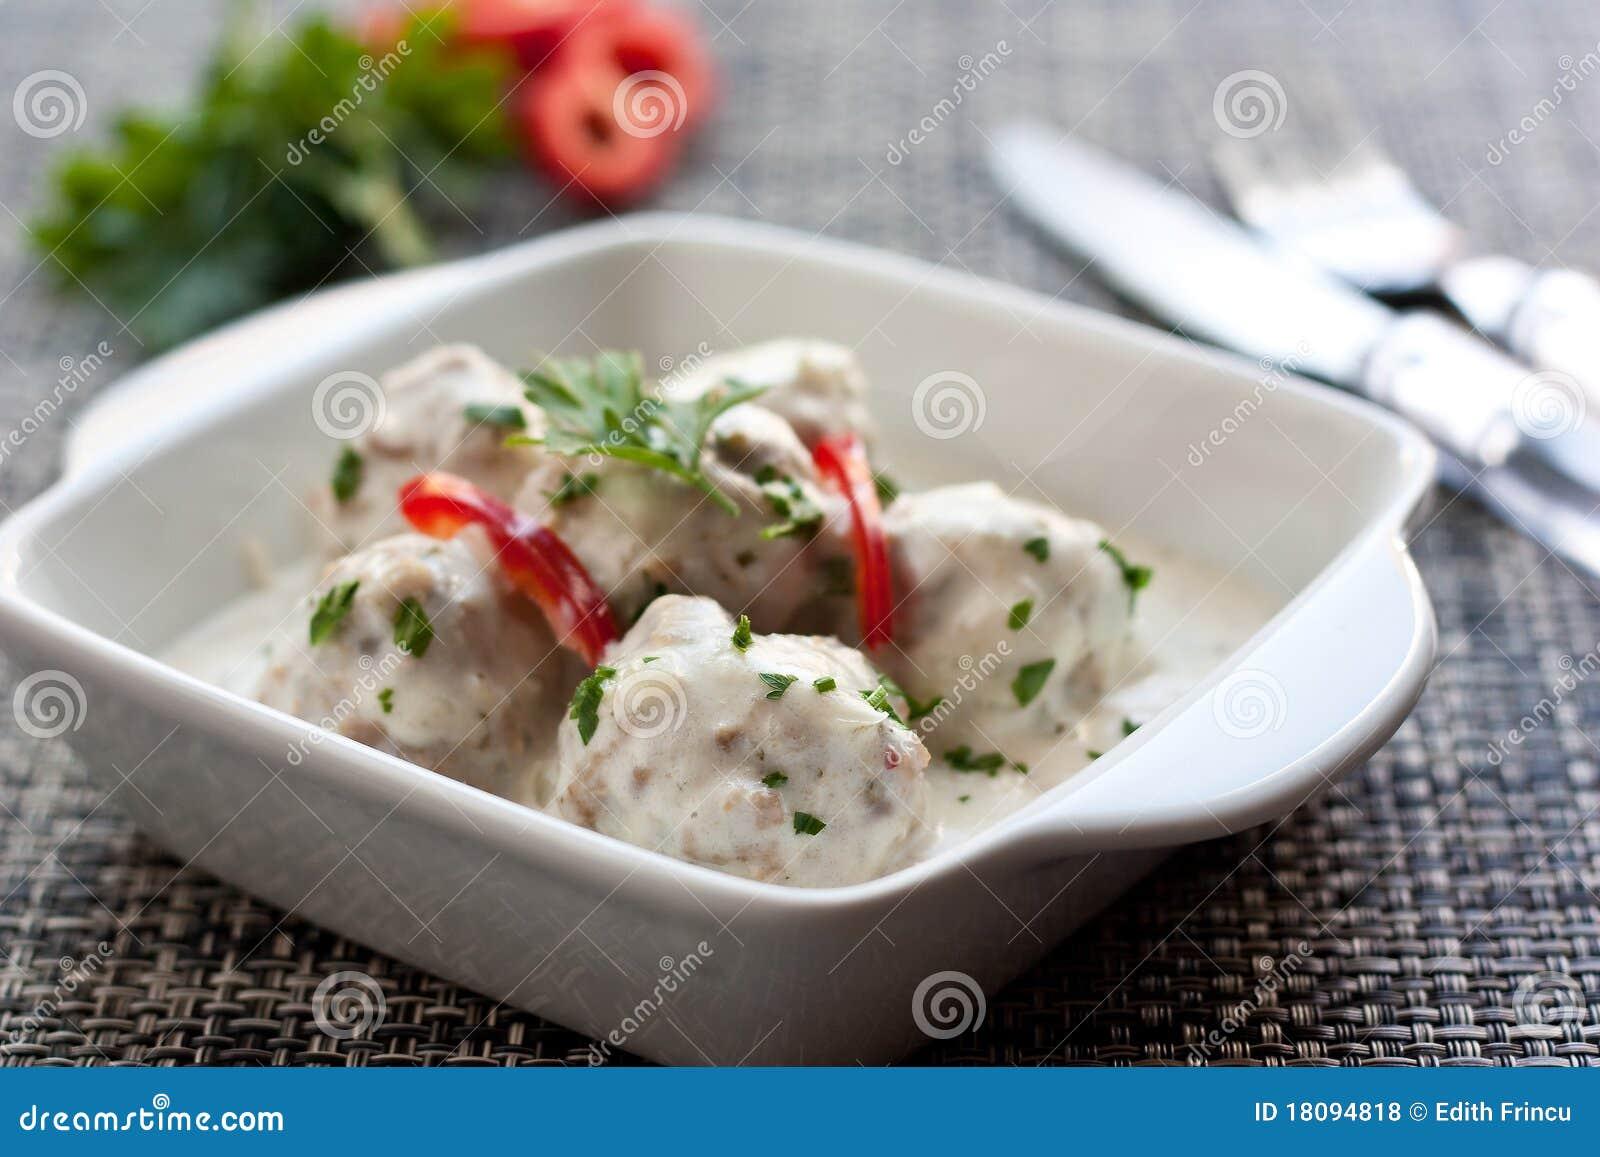 Boulettes de viande en sauce blanche photos libres de droits image 18094818 - Boulette de viande en sauce ...